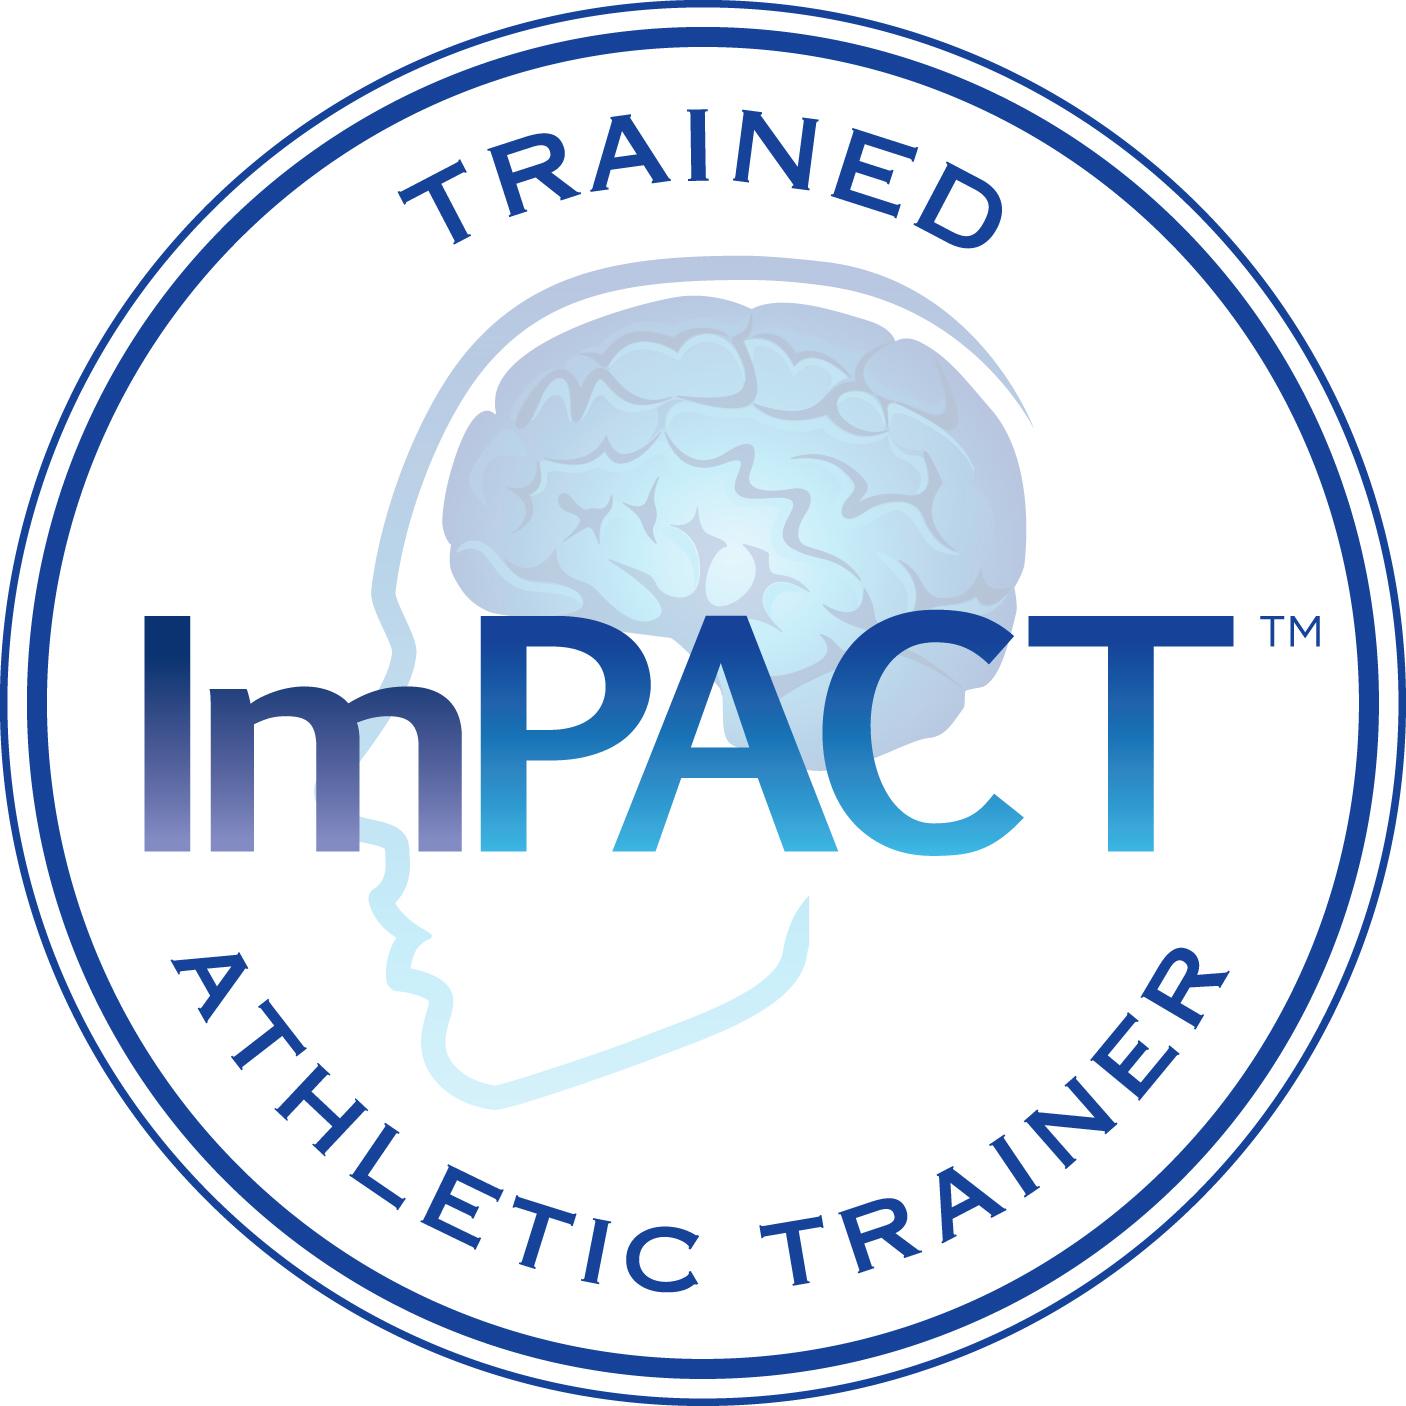 Athletic Training Logo Impact S Trained Athletic #ImymVp - Clipart Kid